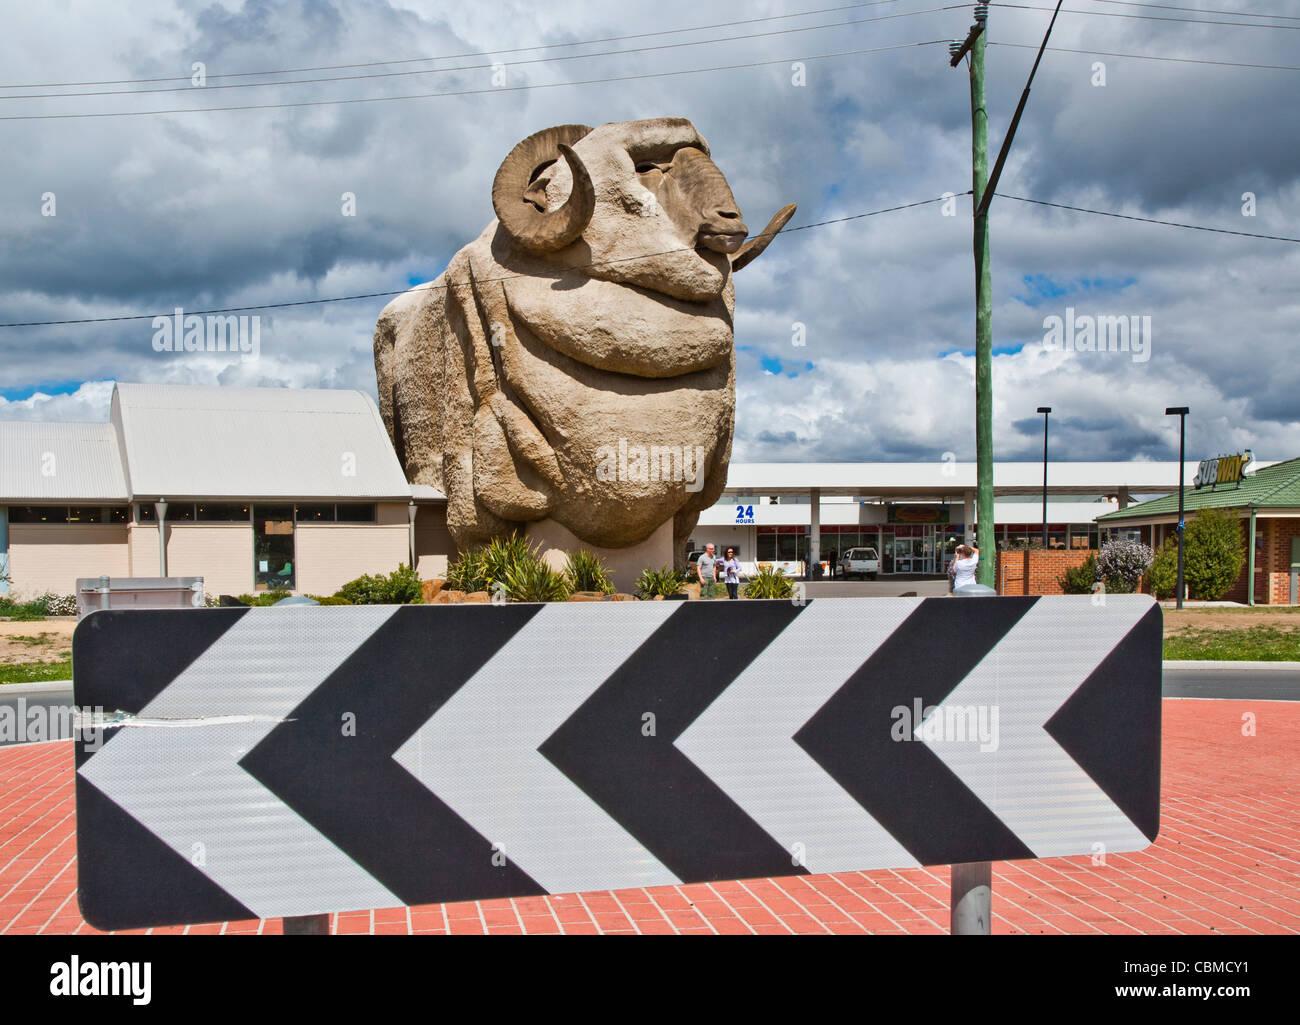 Big Merino, Goulburn, New South Wales, Australia, view of the 15 metre high life-like model of stud ram Rambo - Stock Image